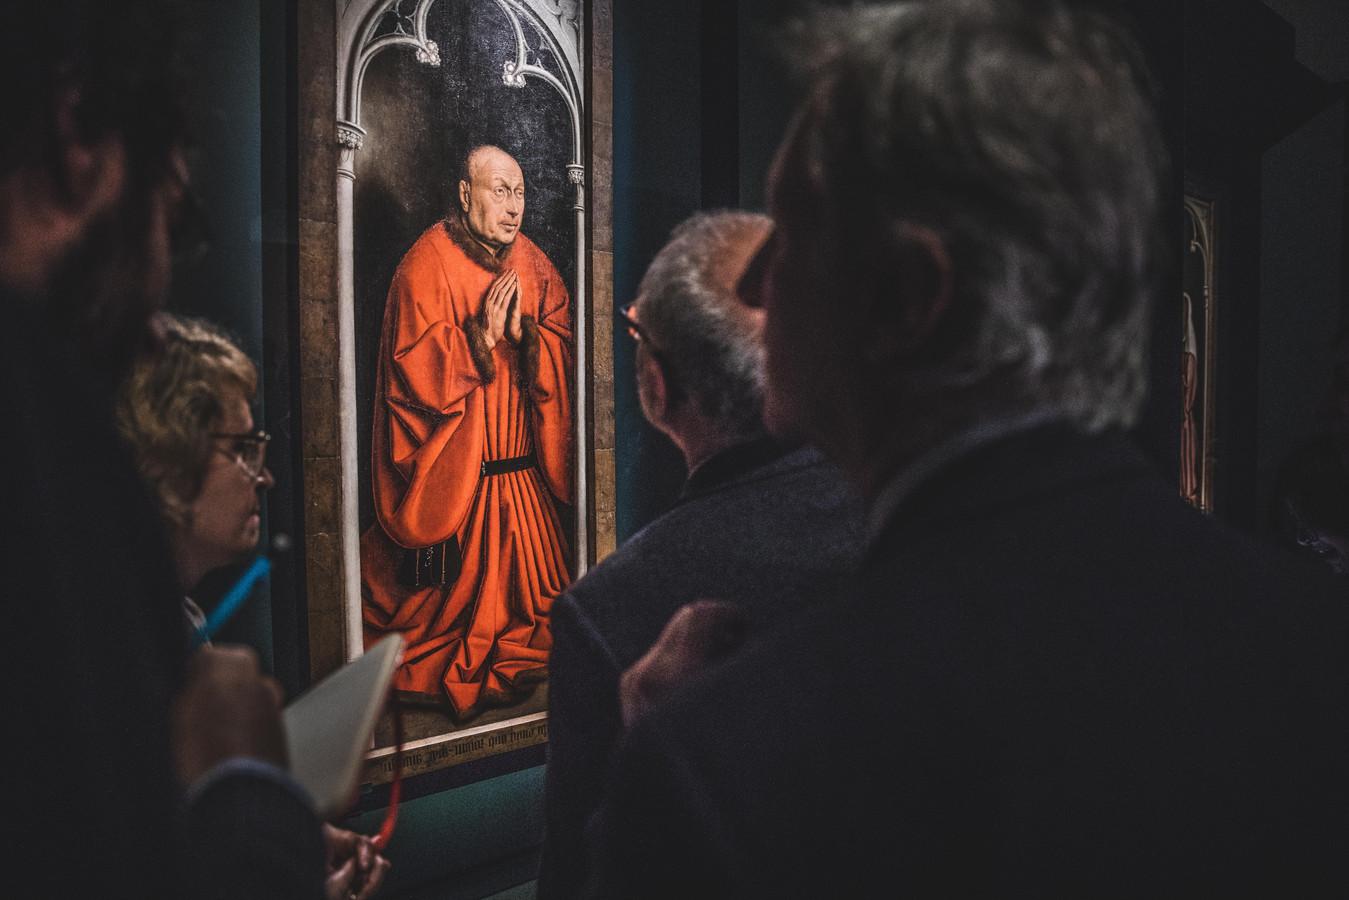 Expo Van Eyck, An Optical Revolution